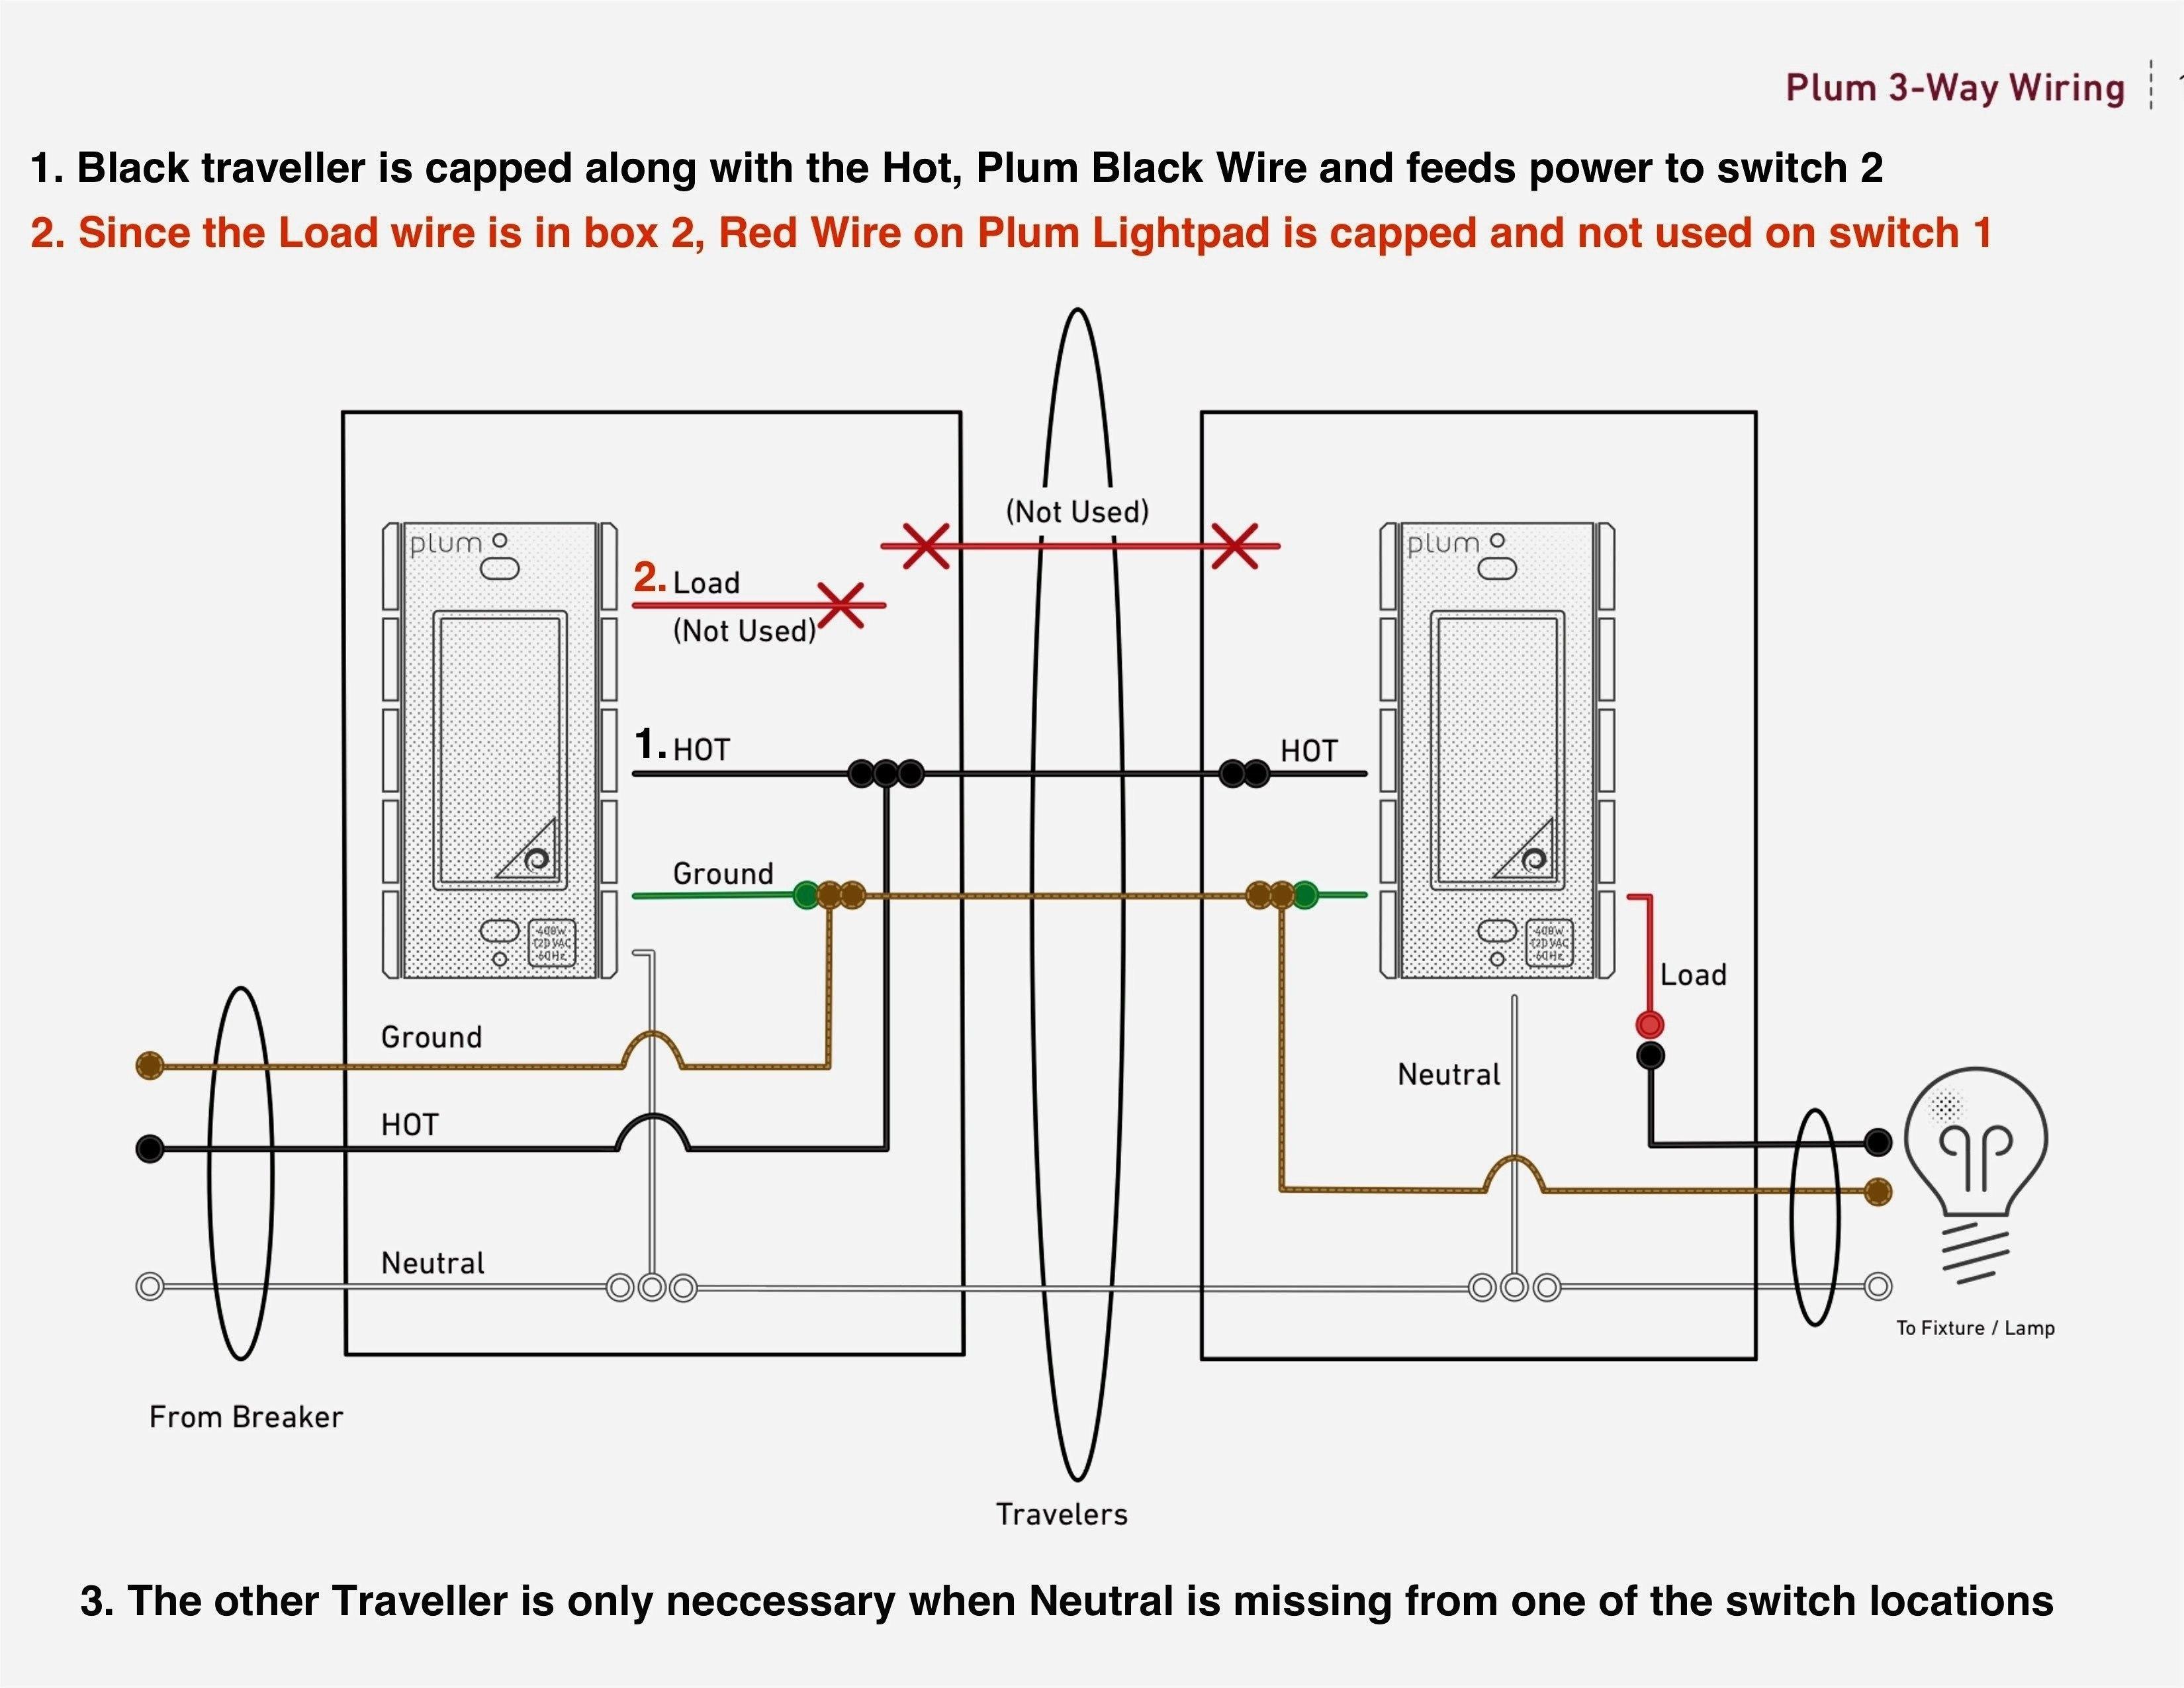 Elegant Wiring A Light Switch Diagram In Uk Diagrams Digramssample Diagramimages Wiringdiagramsample Light Switch Wiring 3 Way Switch Wiring House Wiring